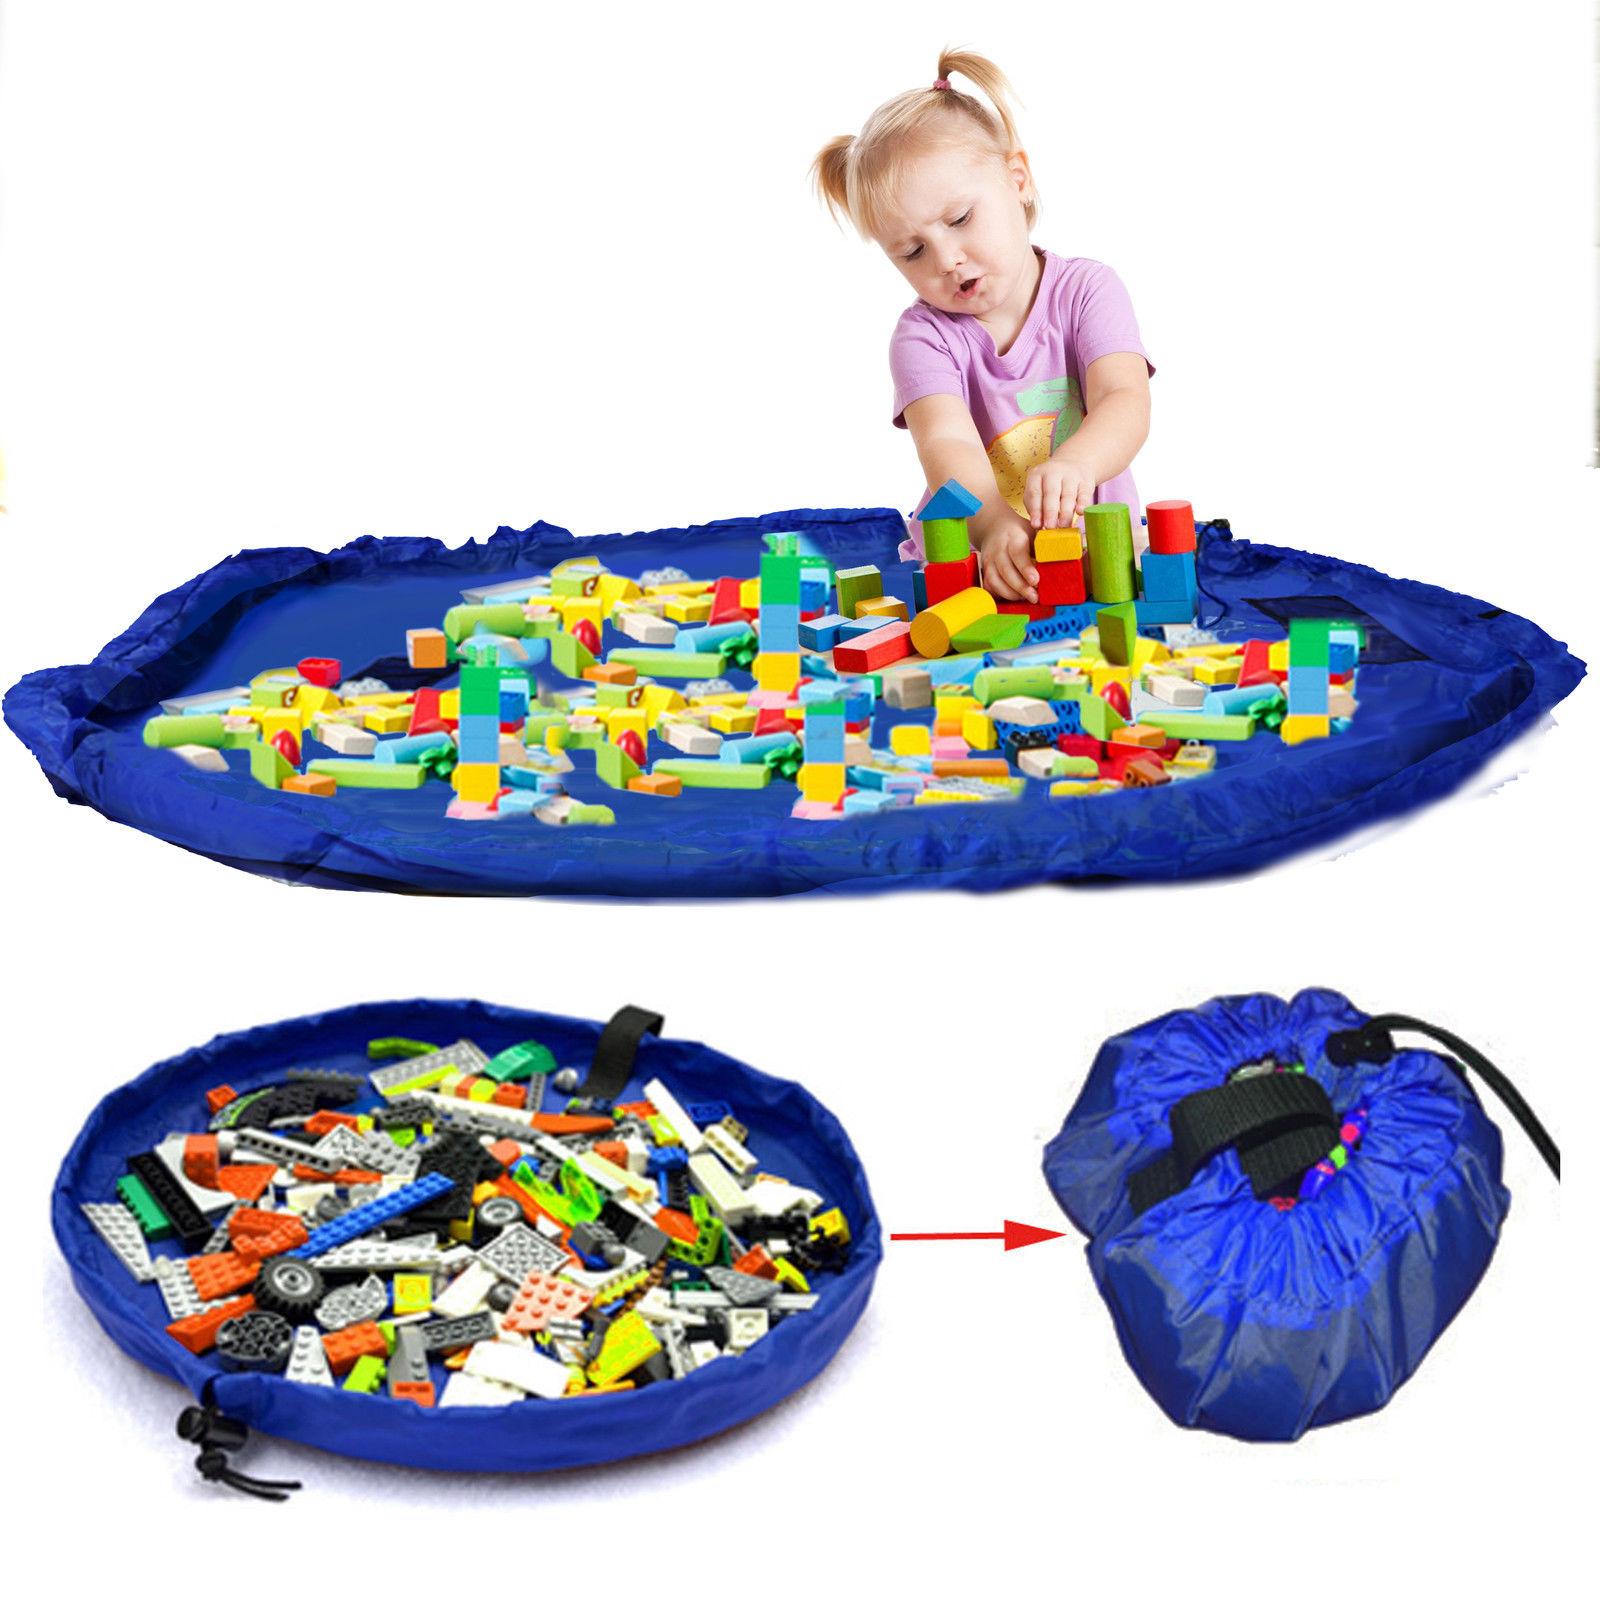 tummy itm time sit play toys activity soft crawl mat baby pillow newborn center gym